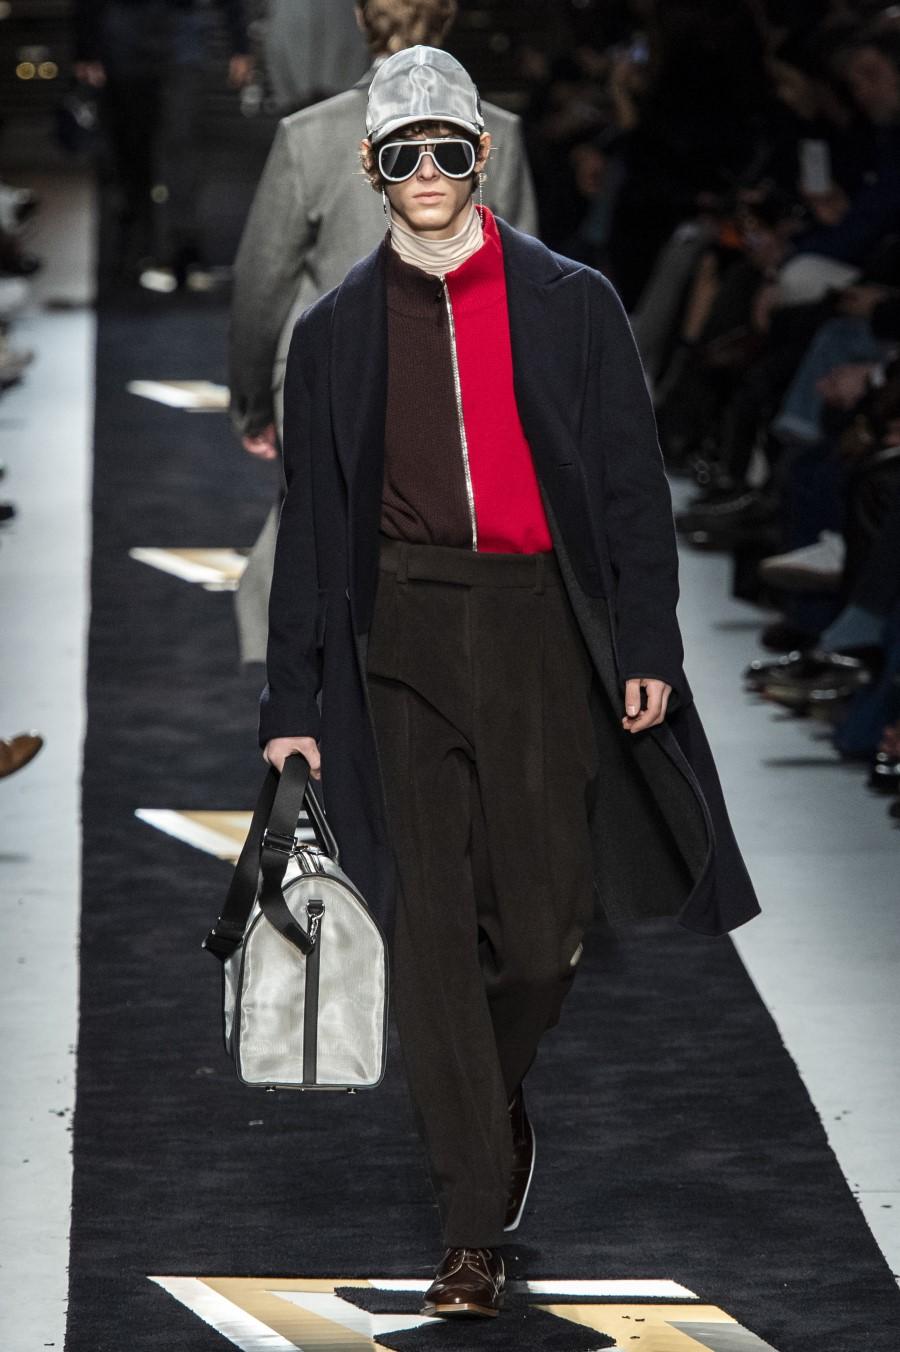 Fendi Men's Fall Winter 2019 - Milano Moda Uomo